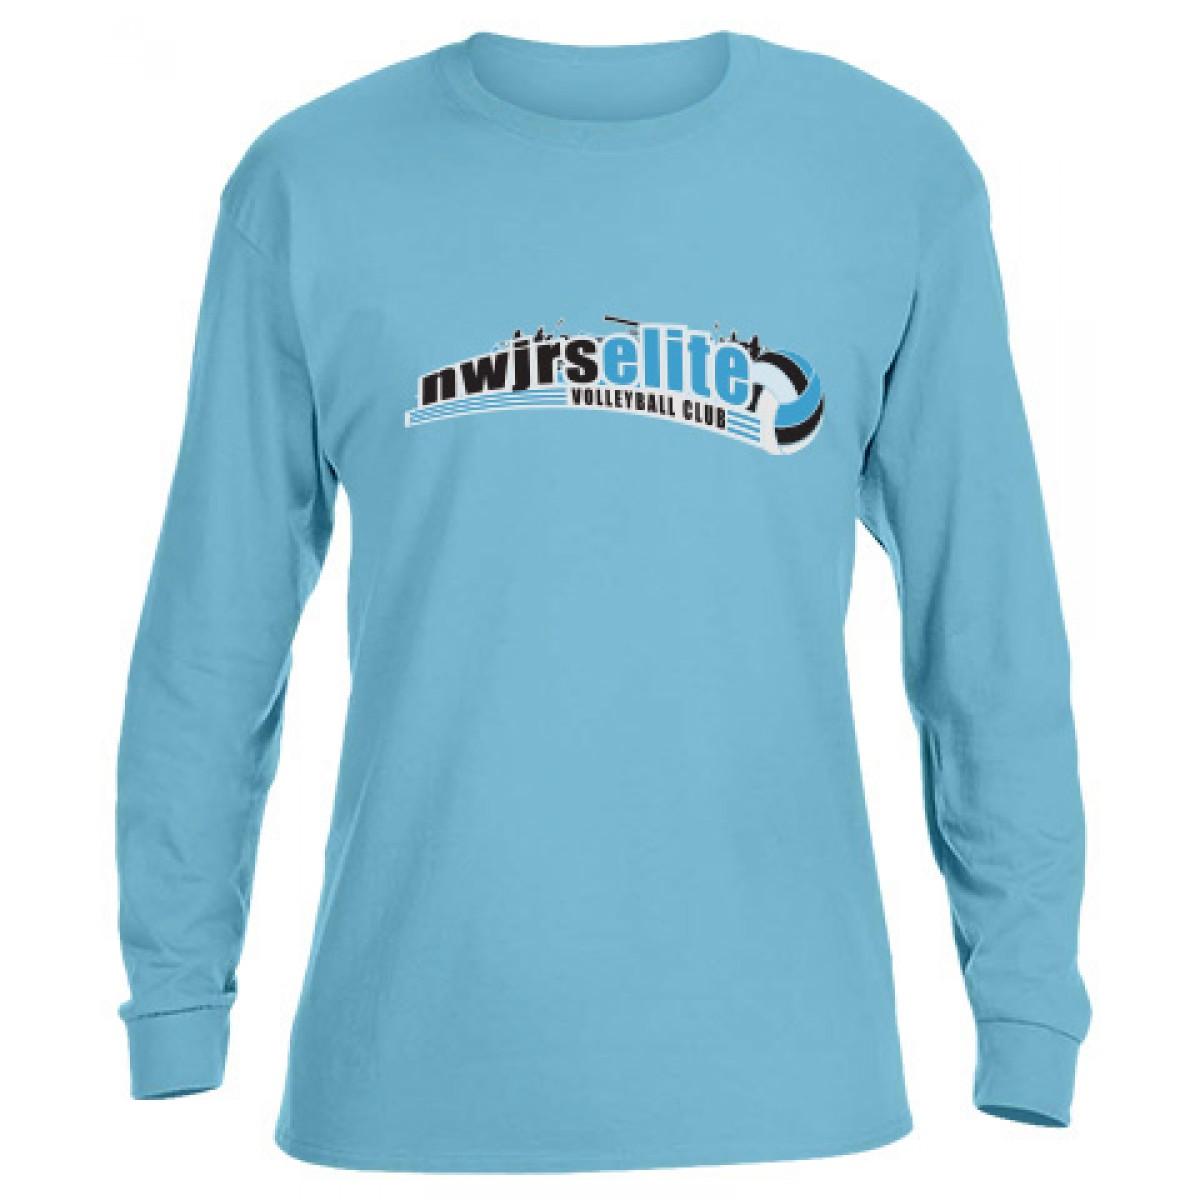 Northwest Volleyball Foundation Scholarship Program-Sky Blue-S